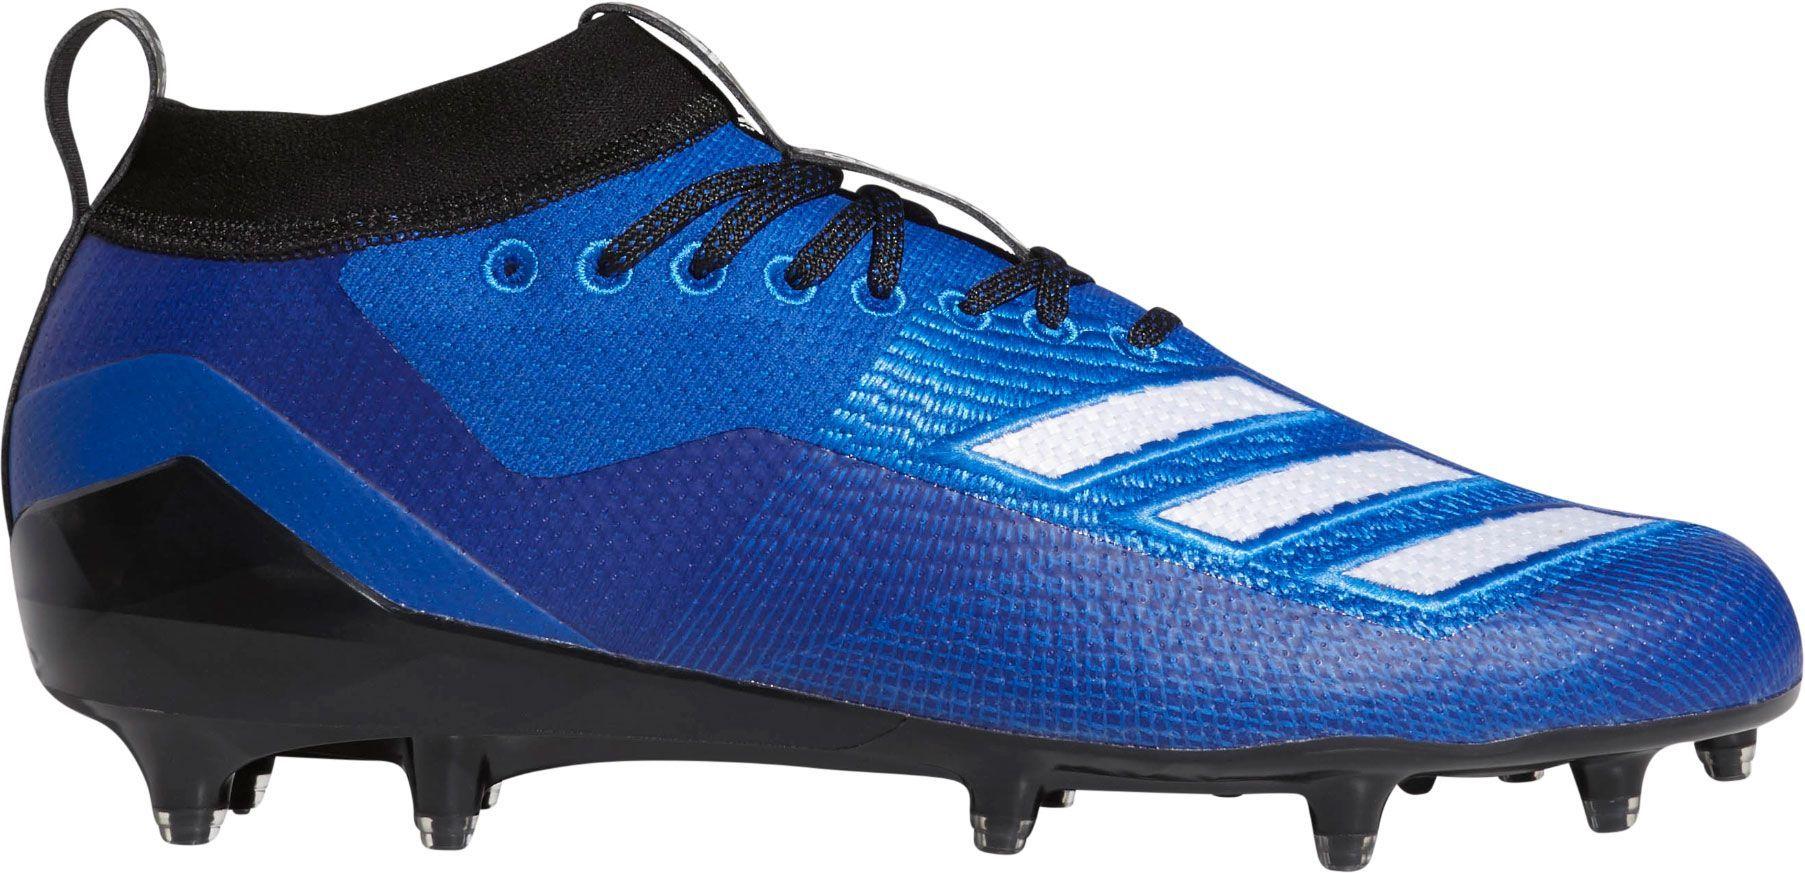 official photos 881ad 75a77 adidas Men s adizero 8.0 Burner Football Cleats, Size  15.0, Blue